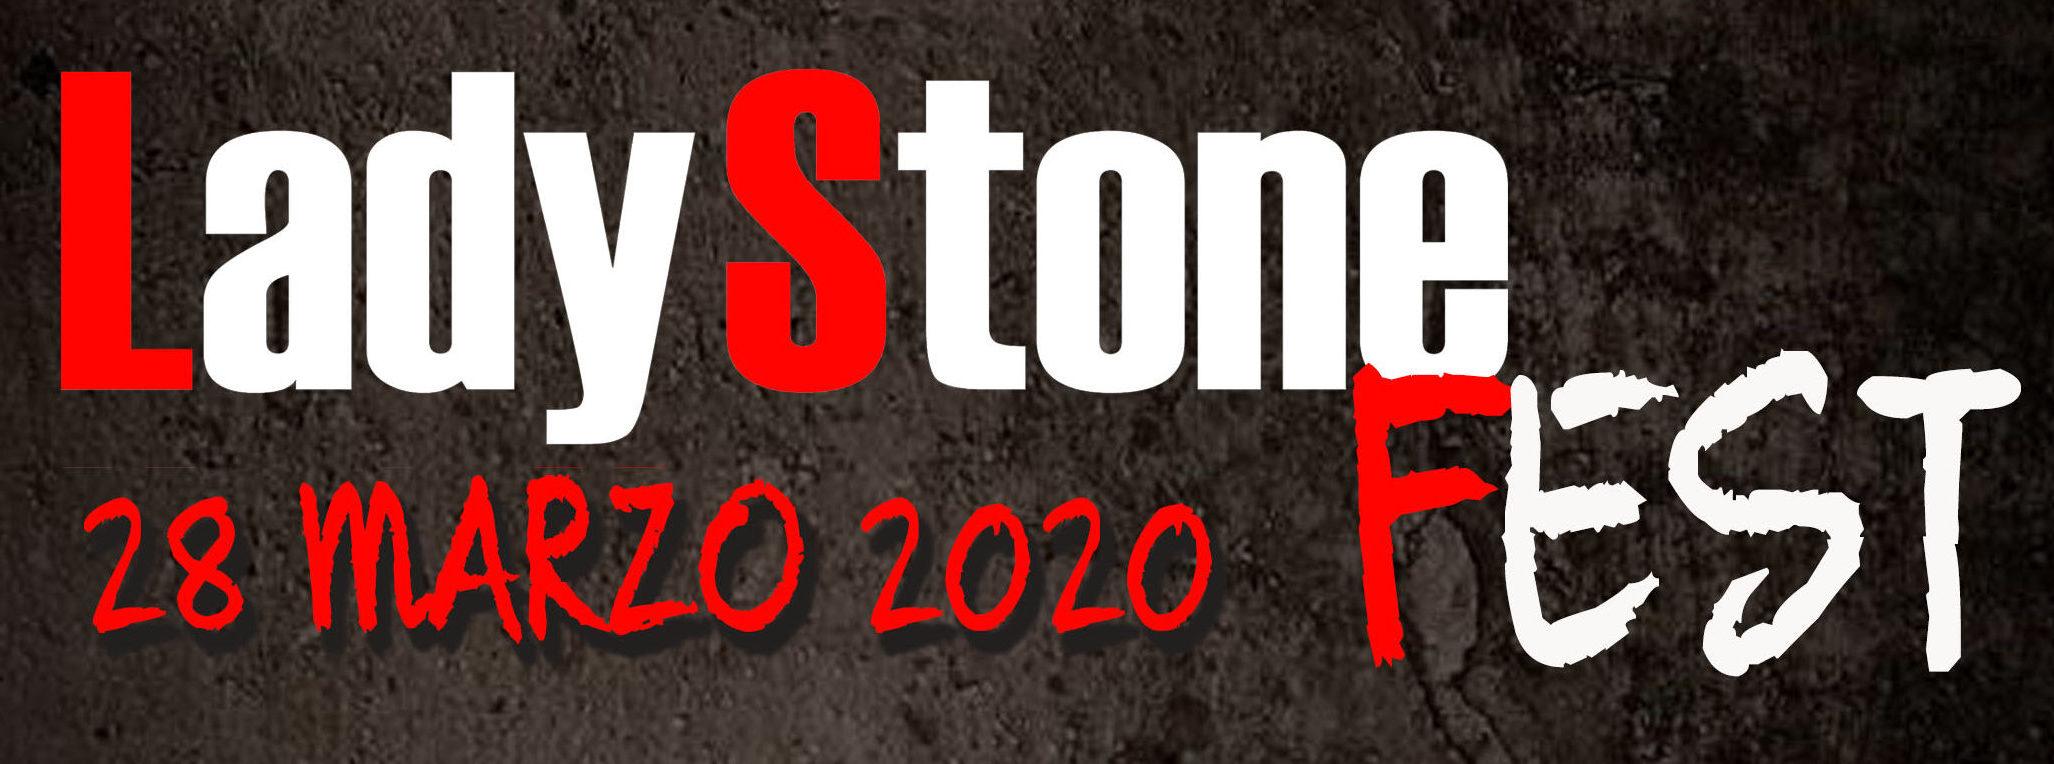 LADY STONE FEST: Eternal Psycho + River Crow + Paralelum – 28 marzo (Madrid)